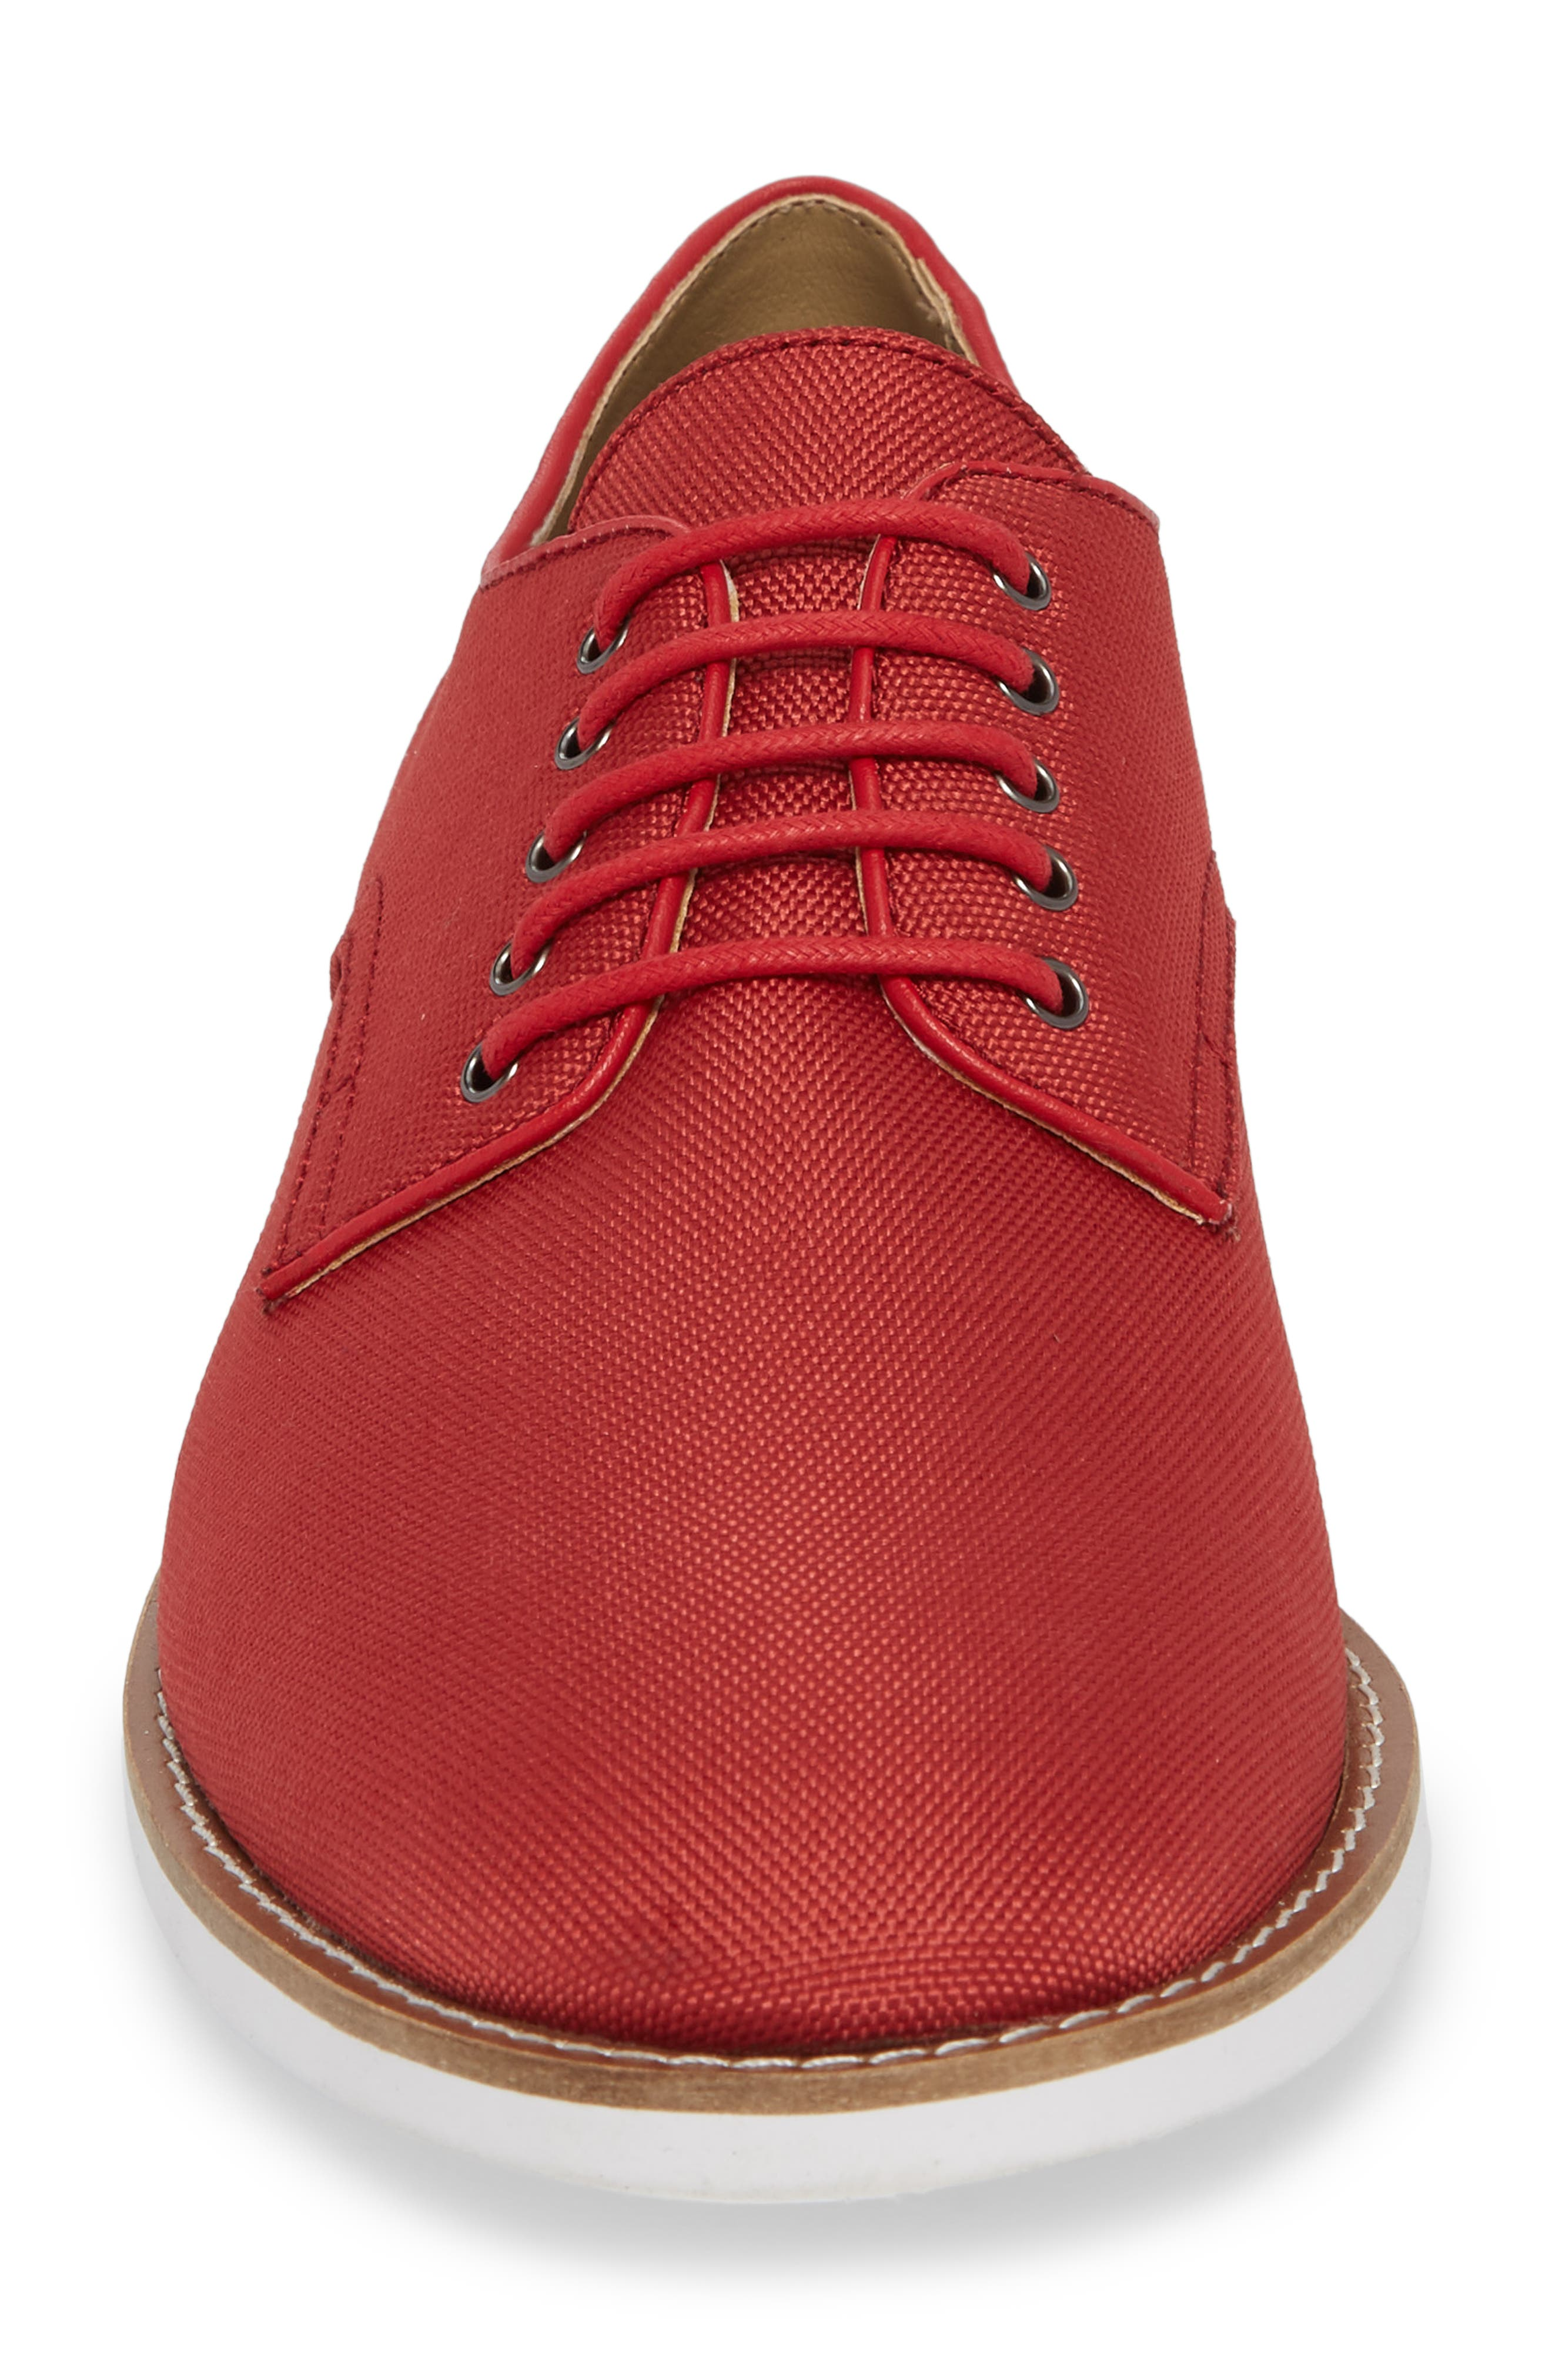 Atlee Plain Toe Derby,                             Alternate thumbnail 4, color,                             Brick Red Nylon